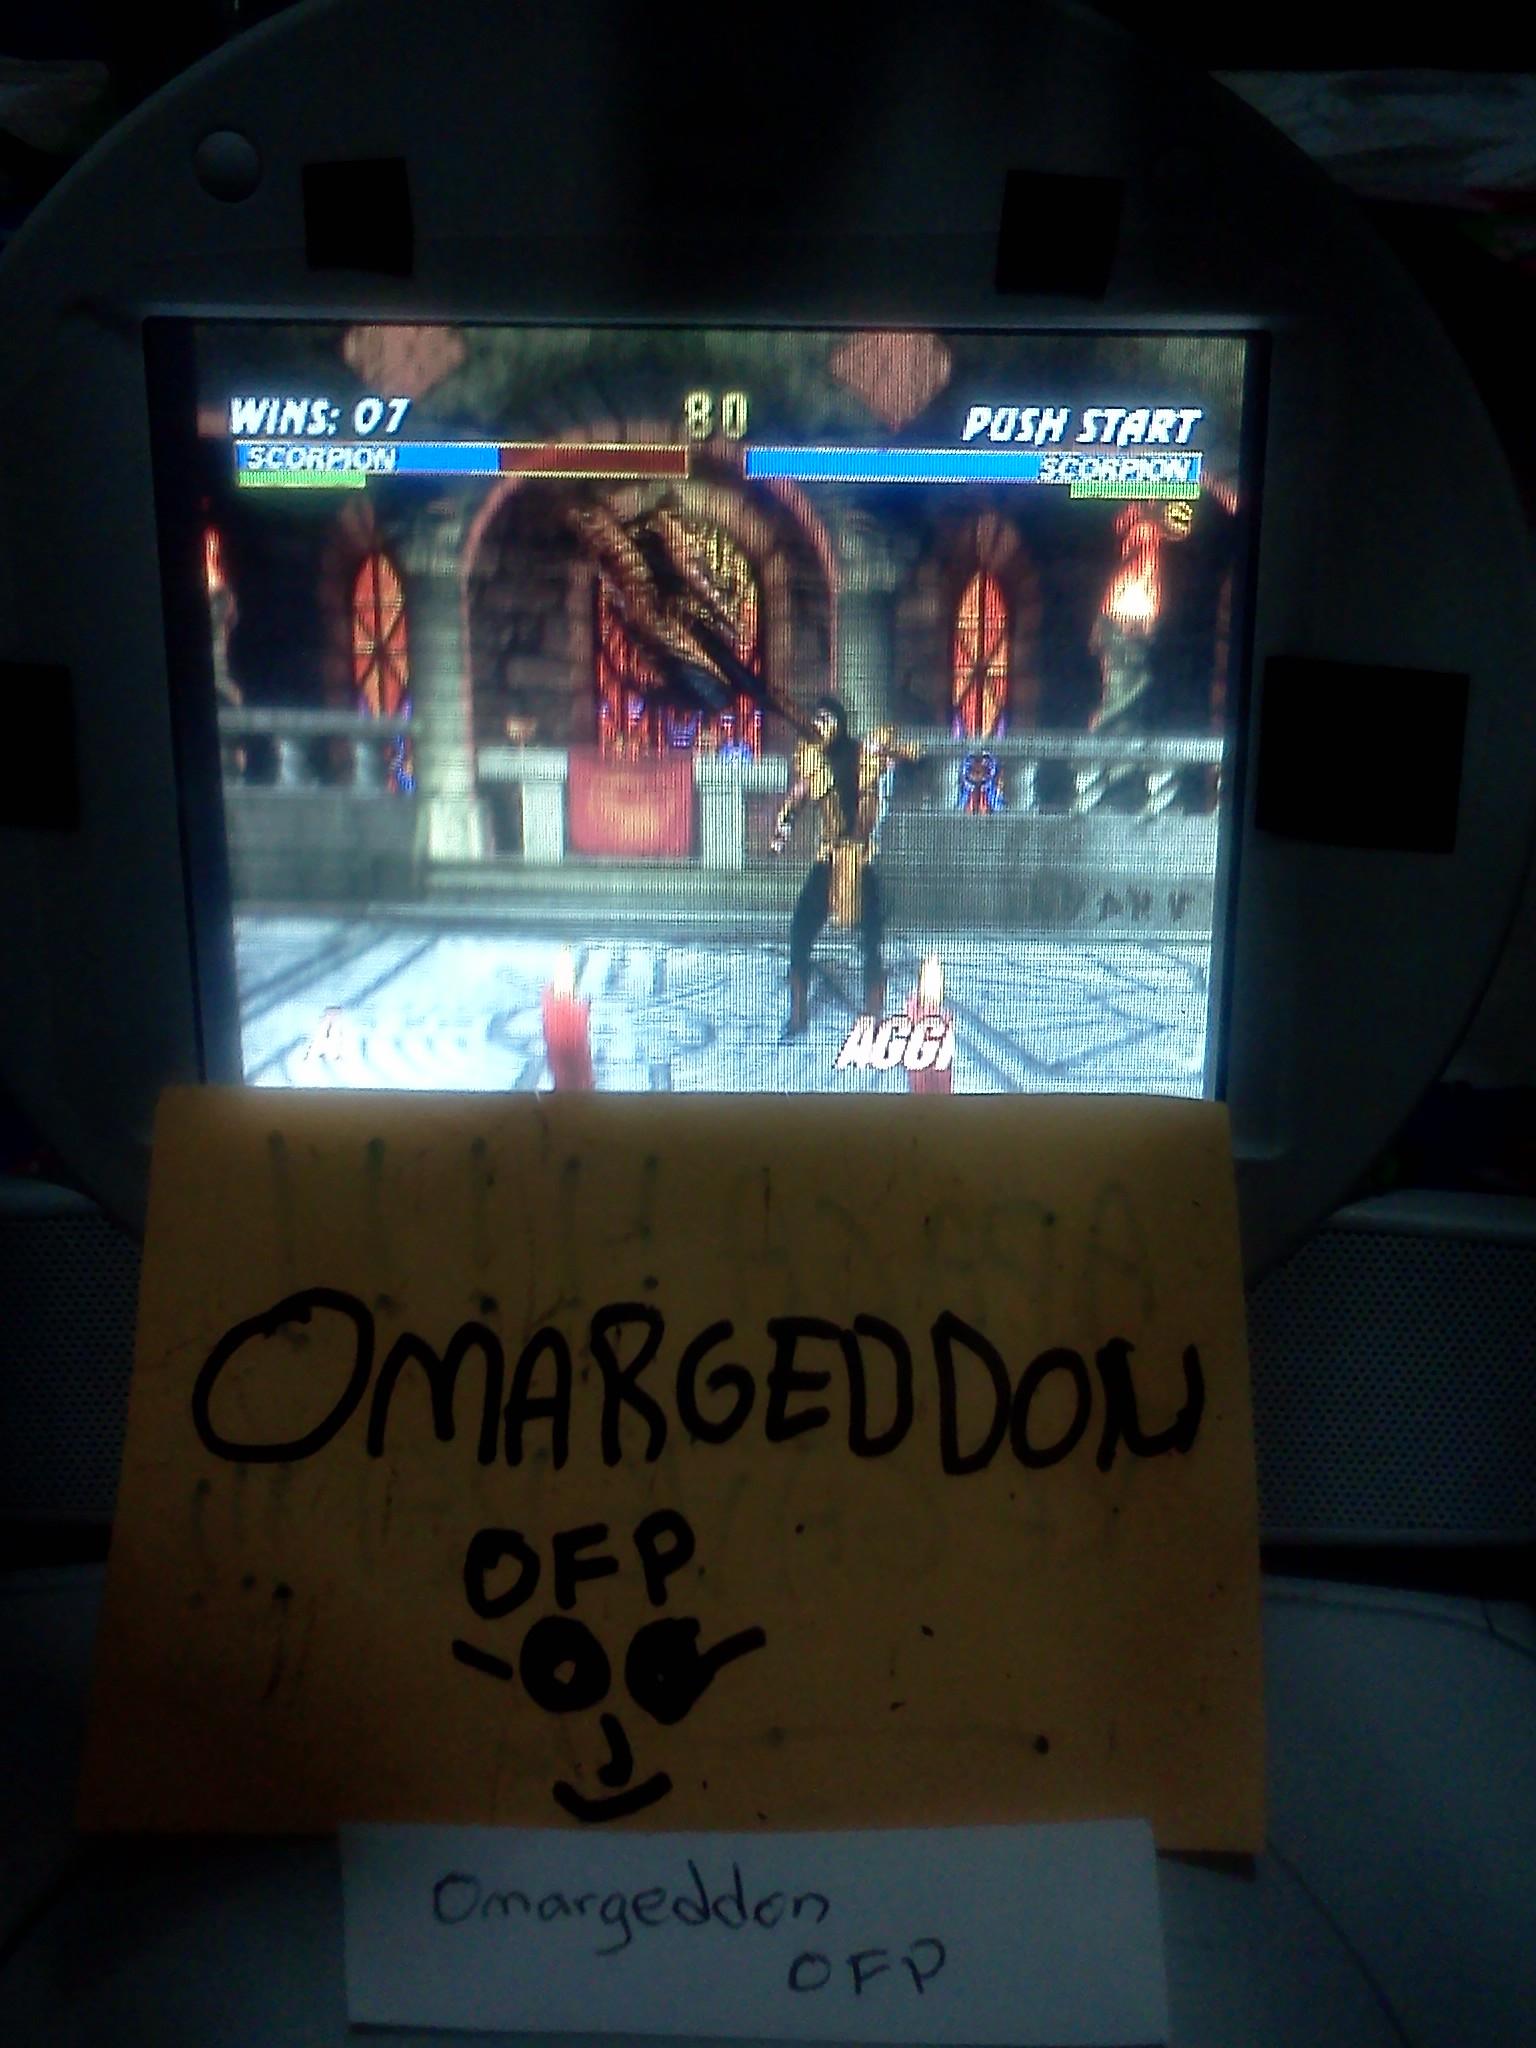 omargeddon: Mortal Kombat Trilogy: Win Streak [Normal] (Playstation 1) 7 points on 2016-07-23 21:28:41